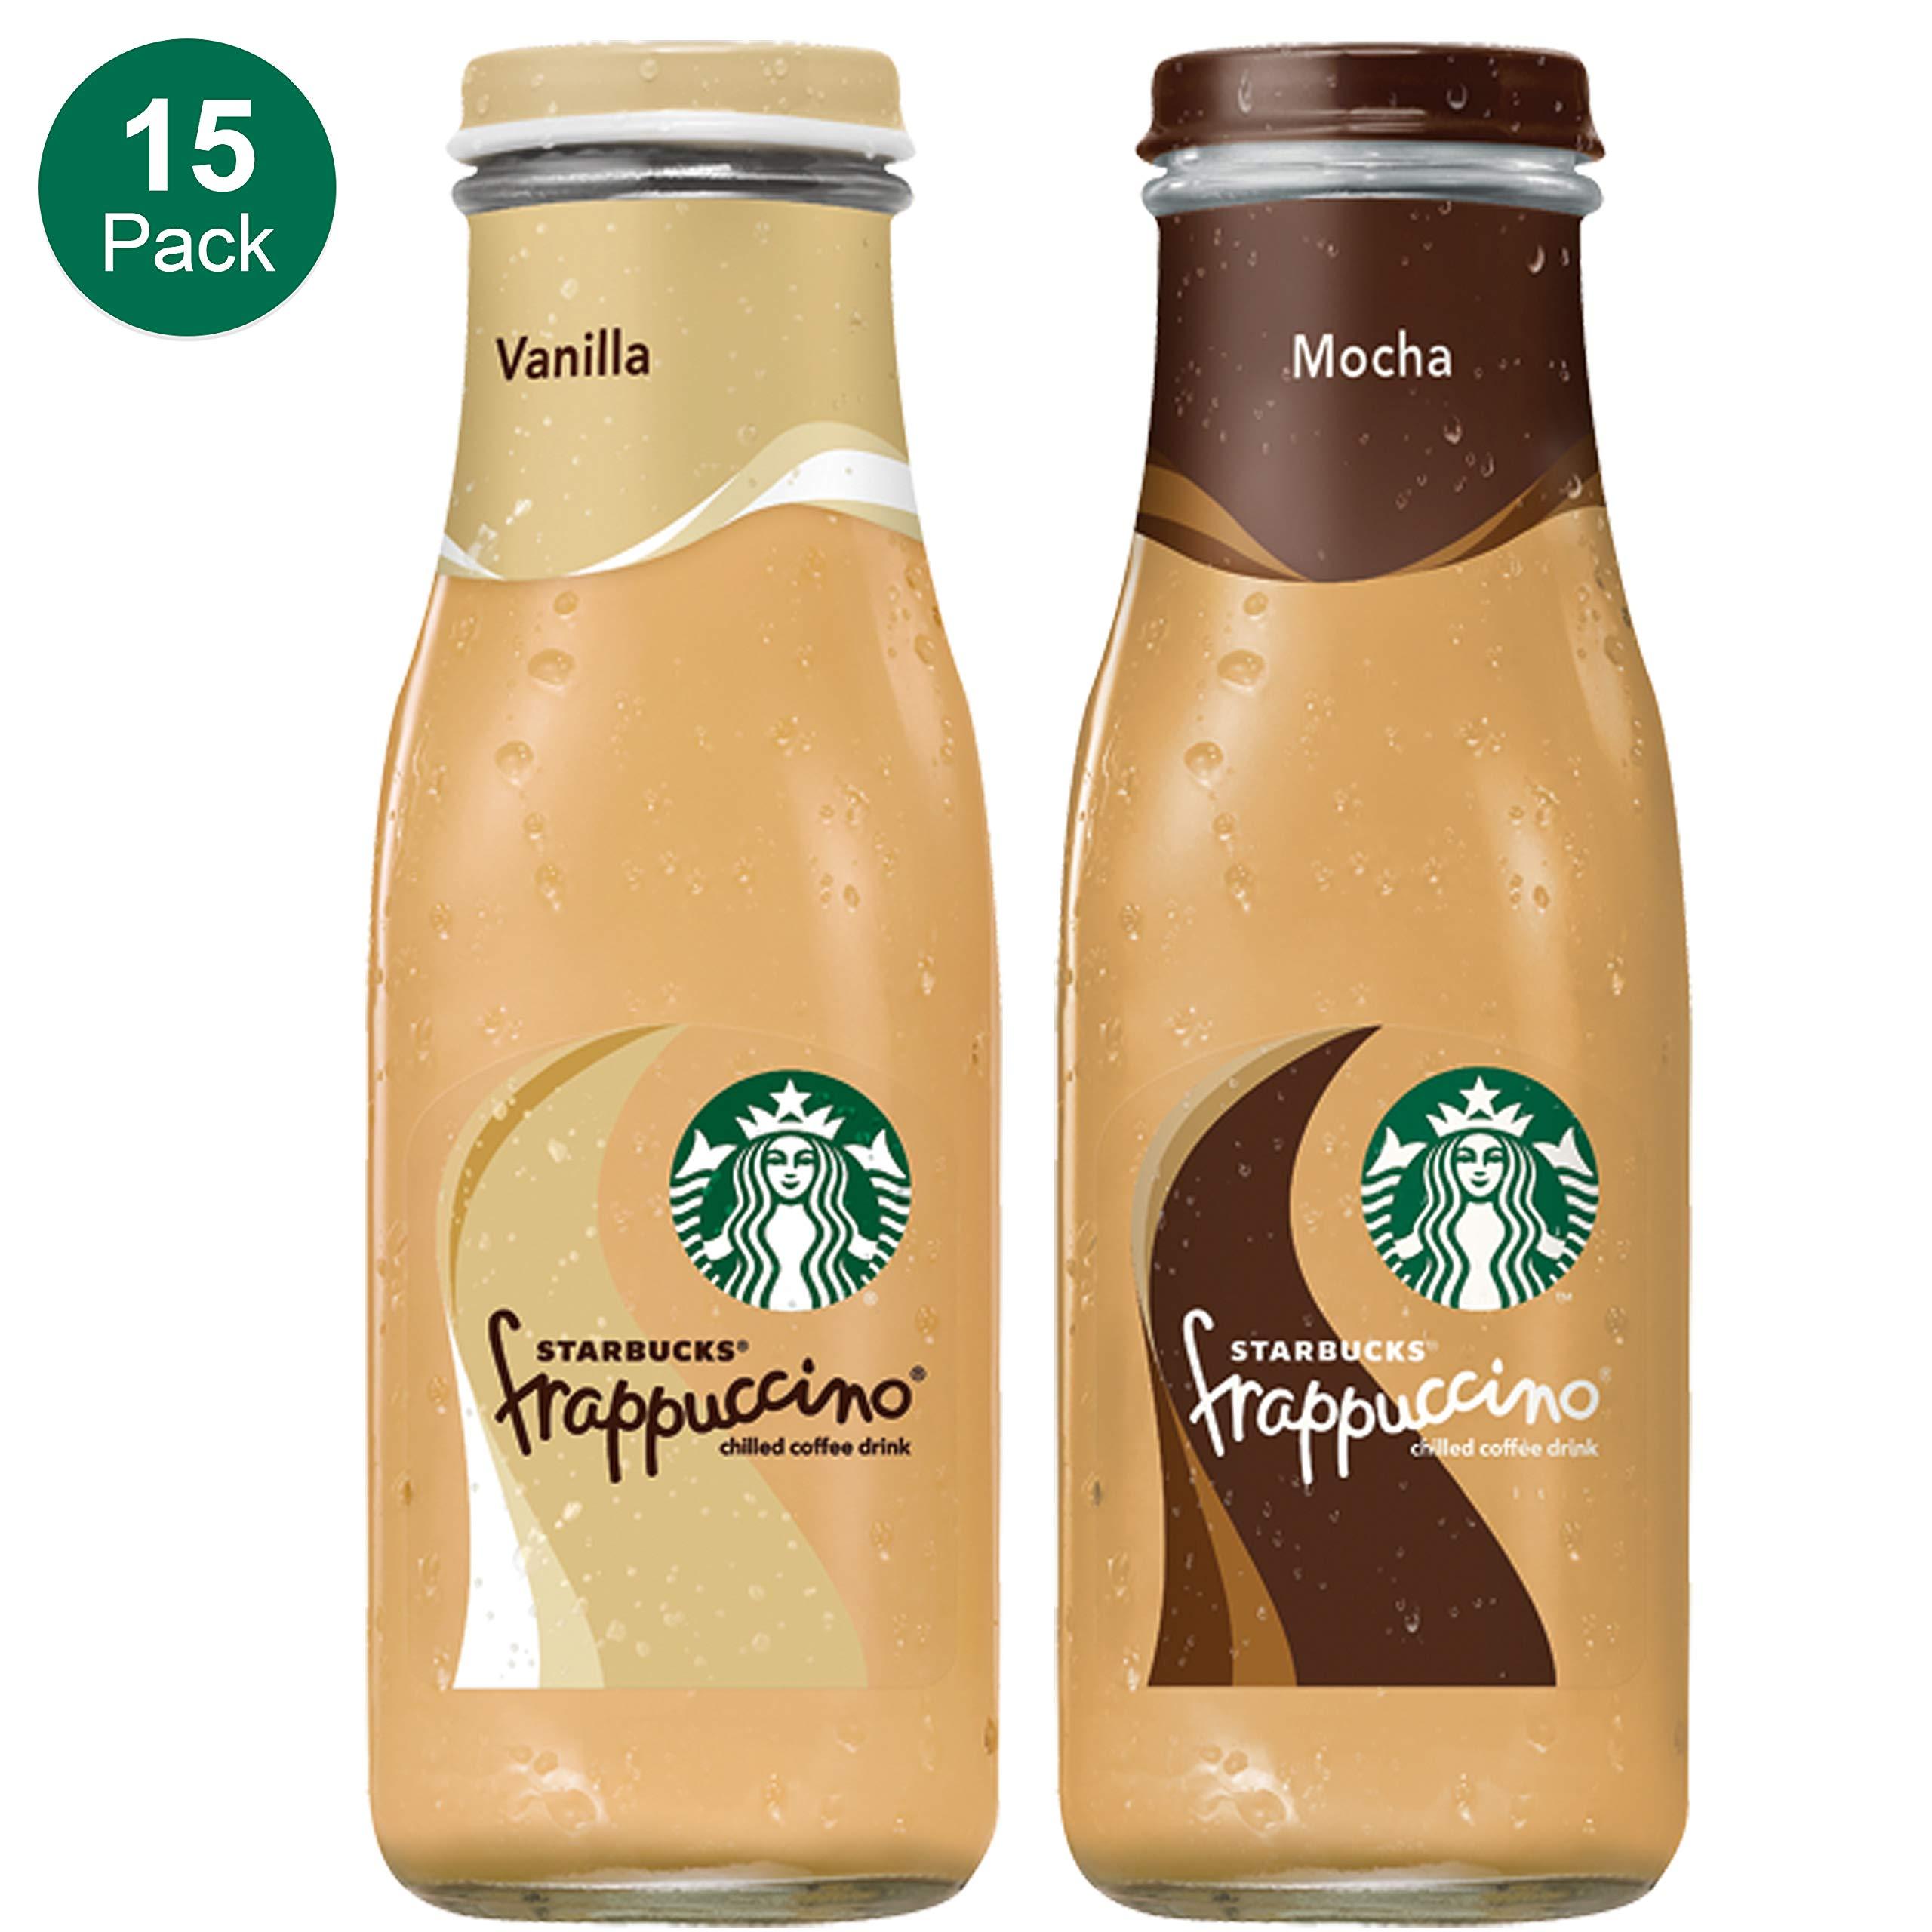 Starbucks Frappuccino Vanilla Glass Bottles 9 5 Fl Oz